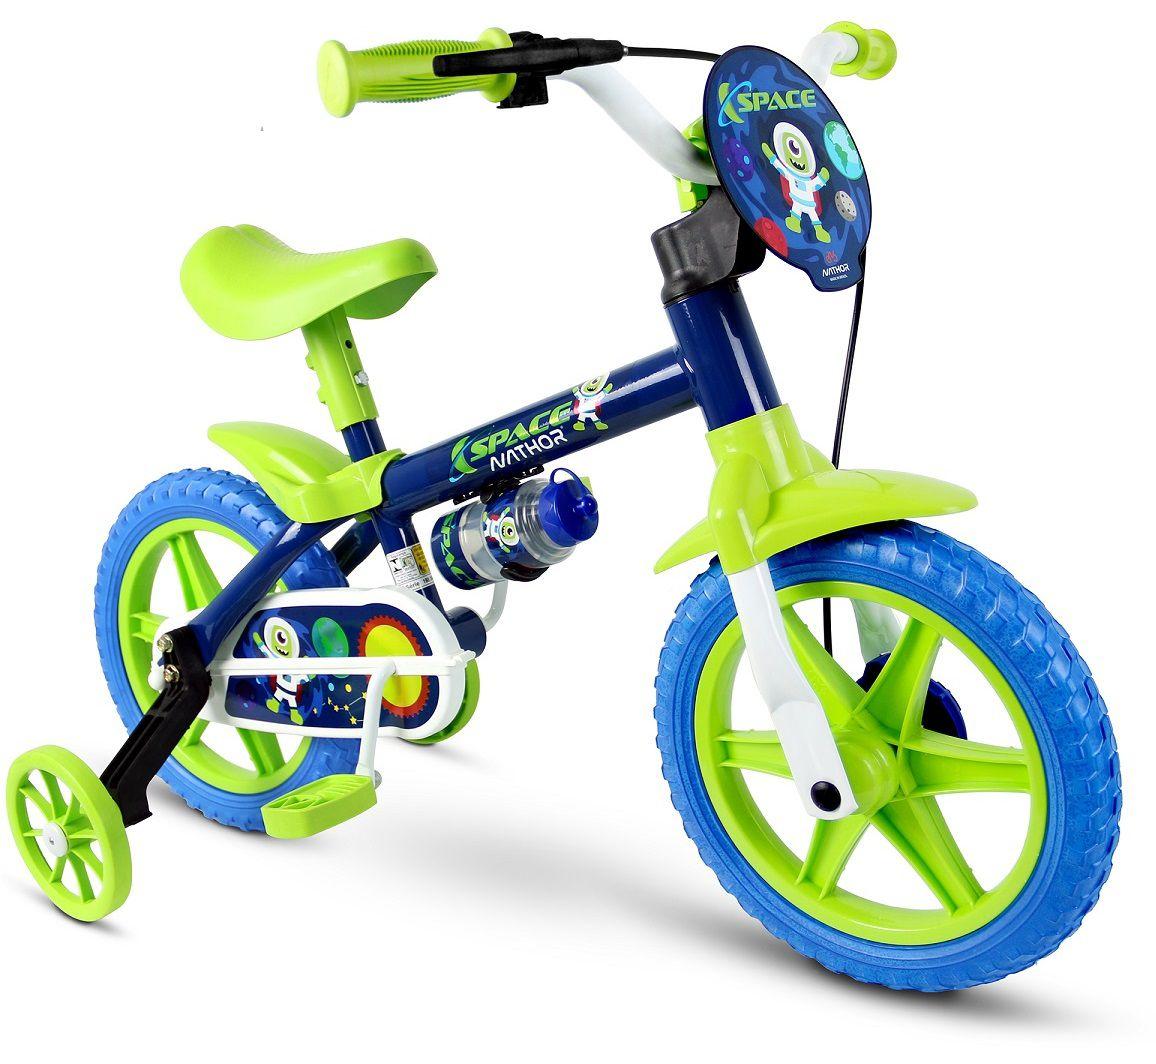 9c5489fad Bicicleta Infantil Aro 12 SPACE Nathor - Pratti bikes